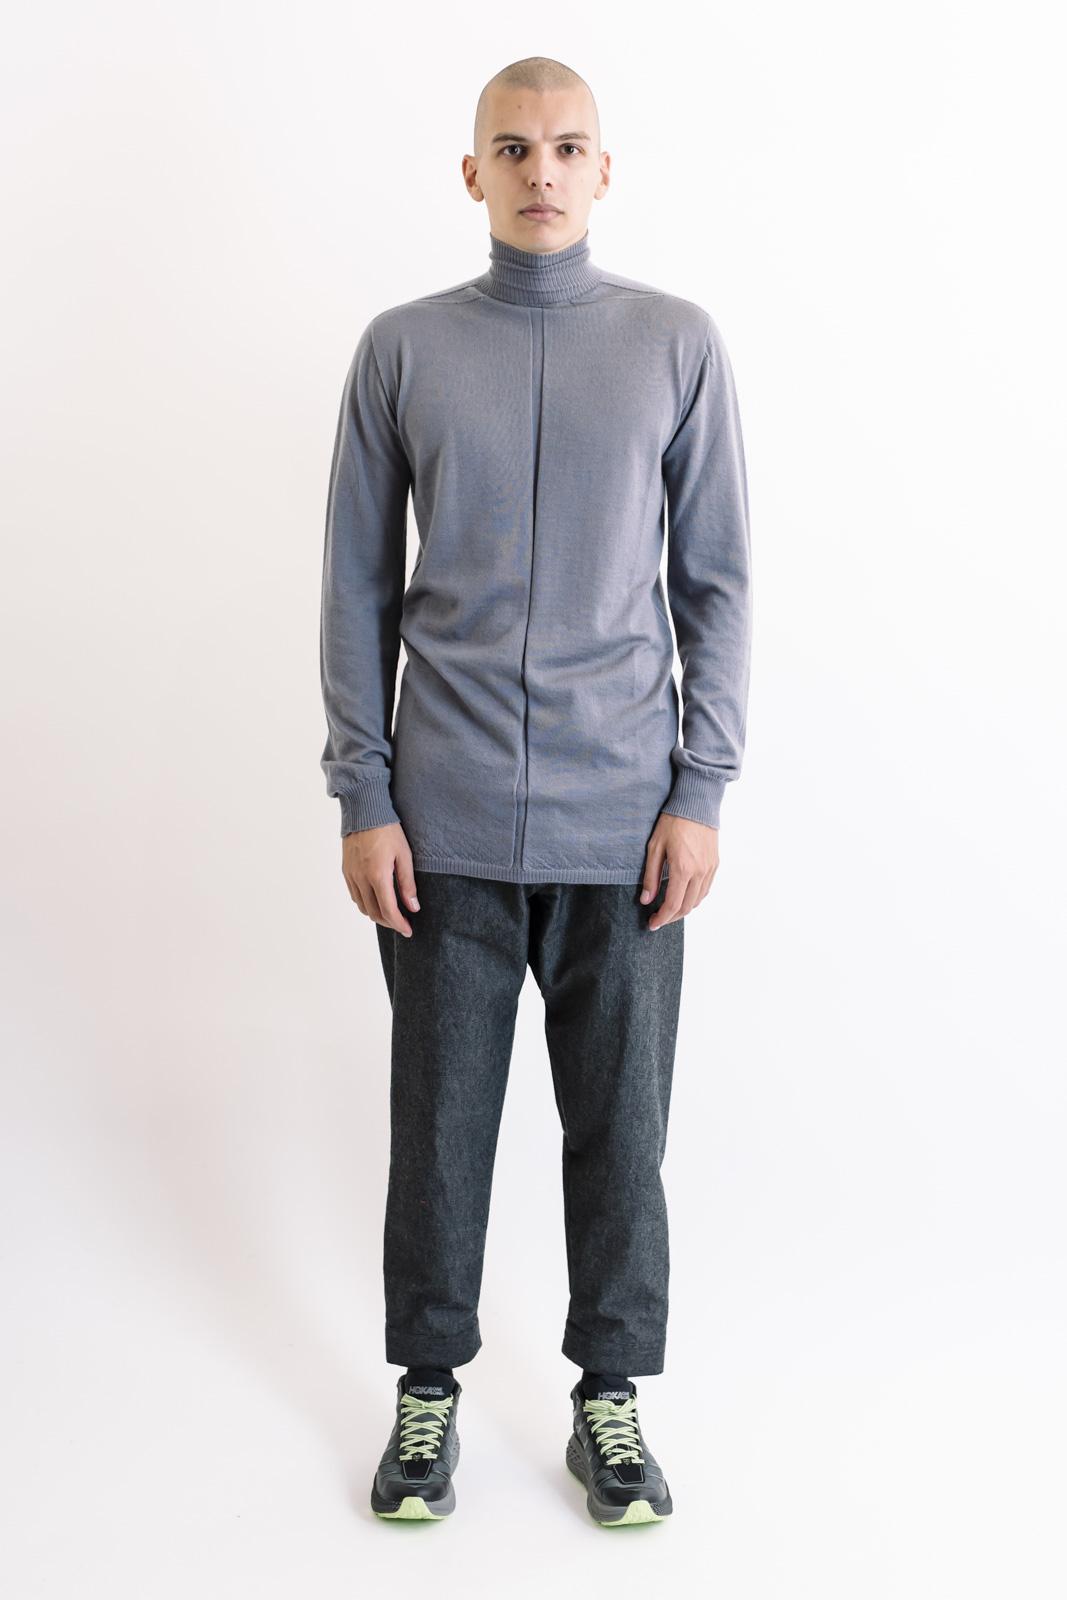 Rick Owens Oversized Turtleneck sweater